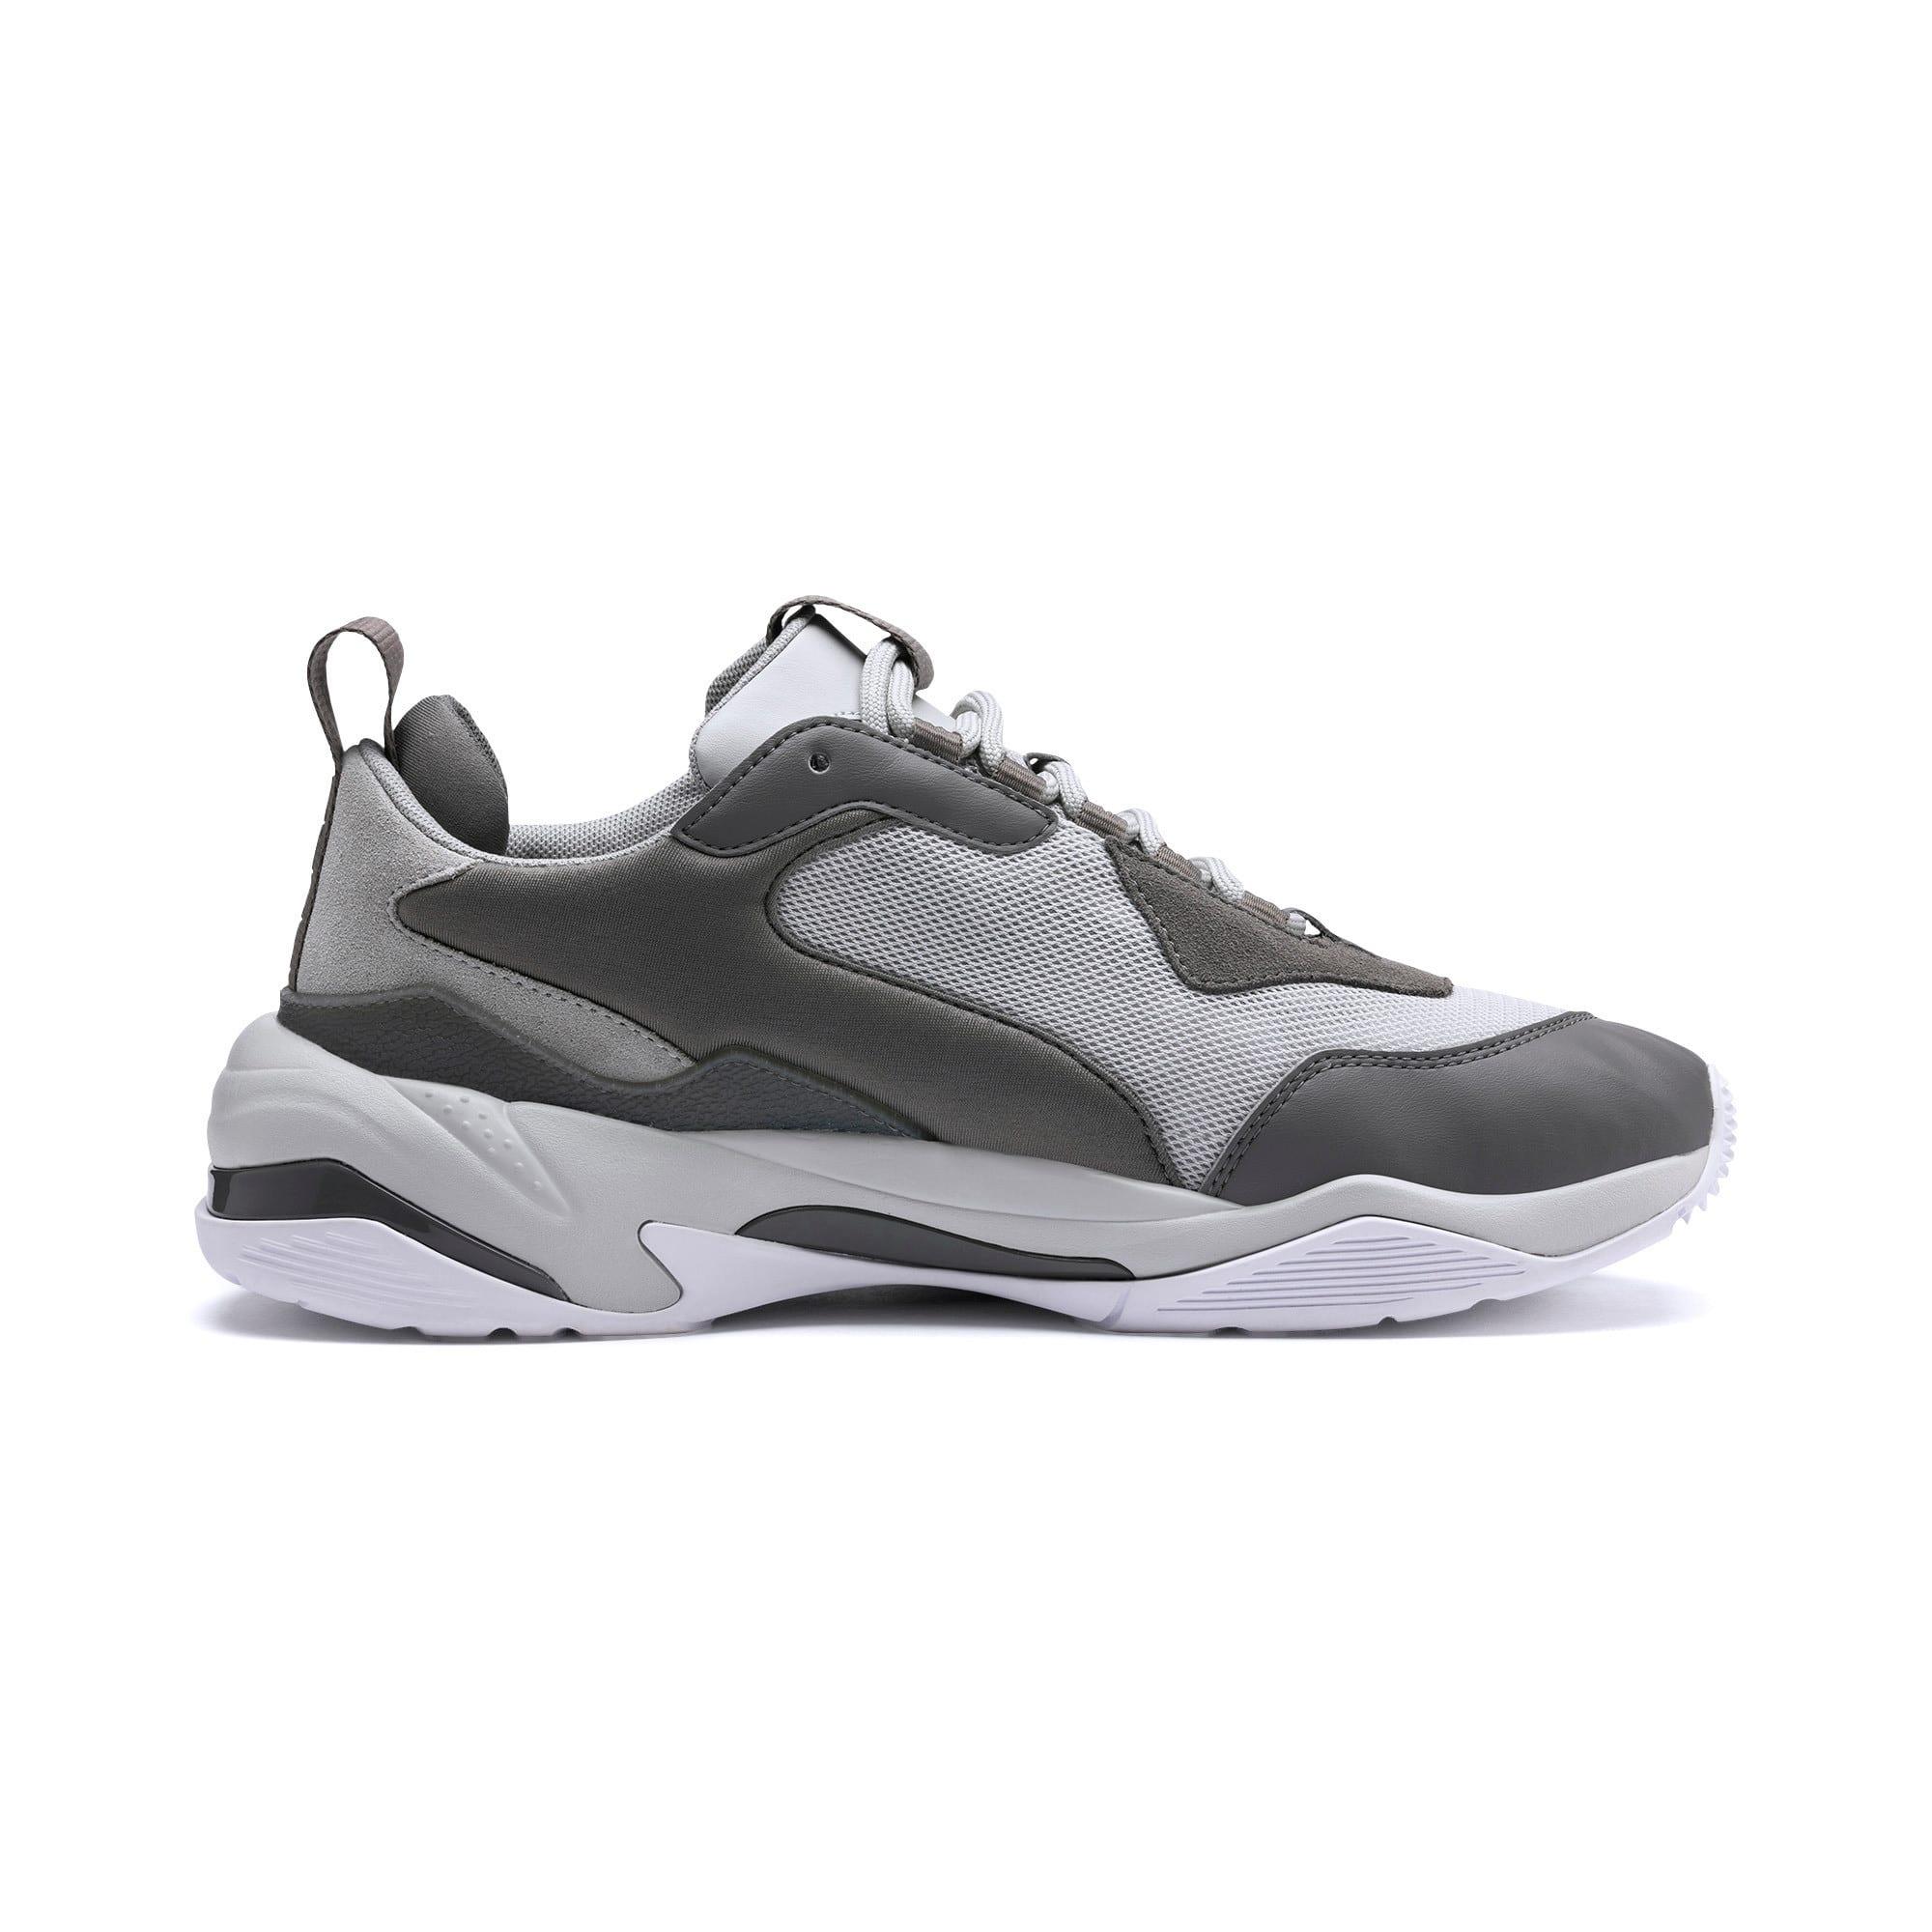 Thumbnail 6 of Thunder Fashion 2.0 Sneakers, High Rise-CASTLEROCK, medium